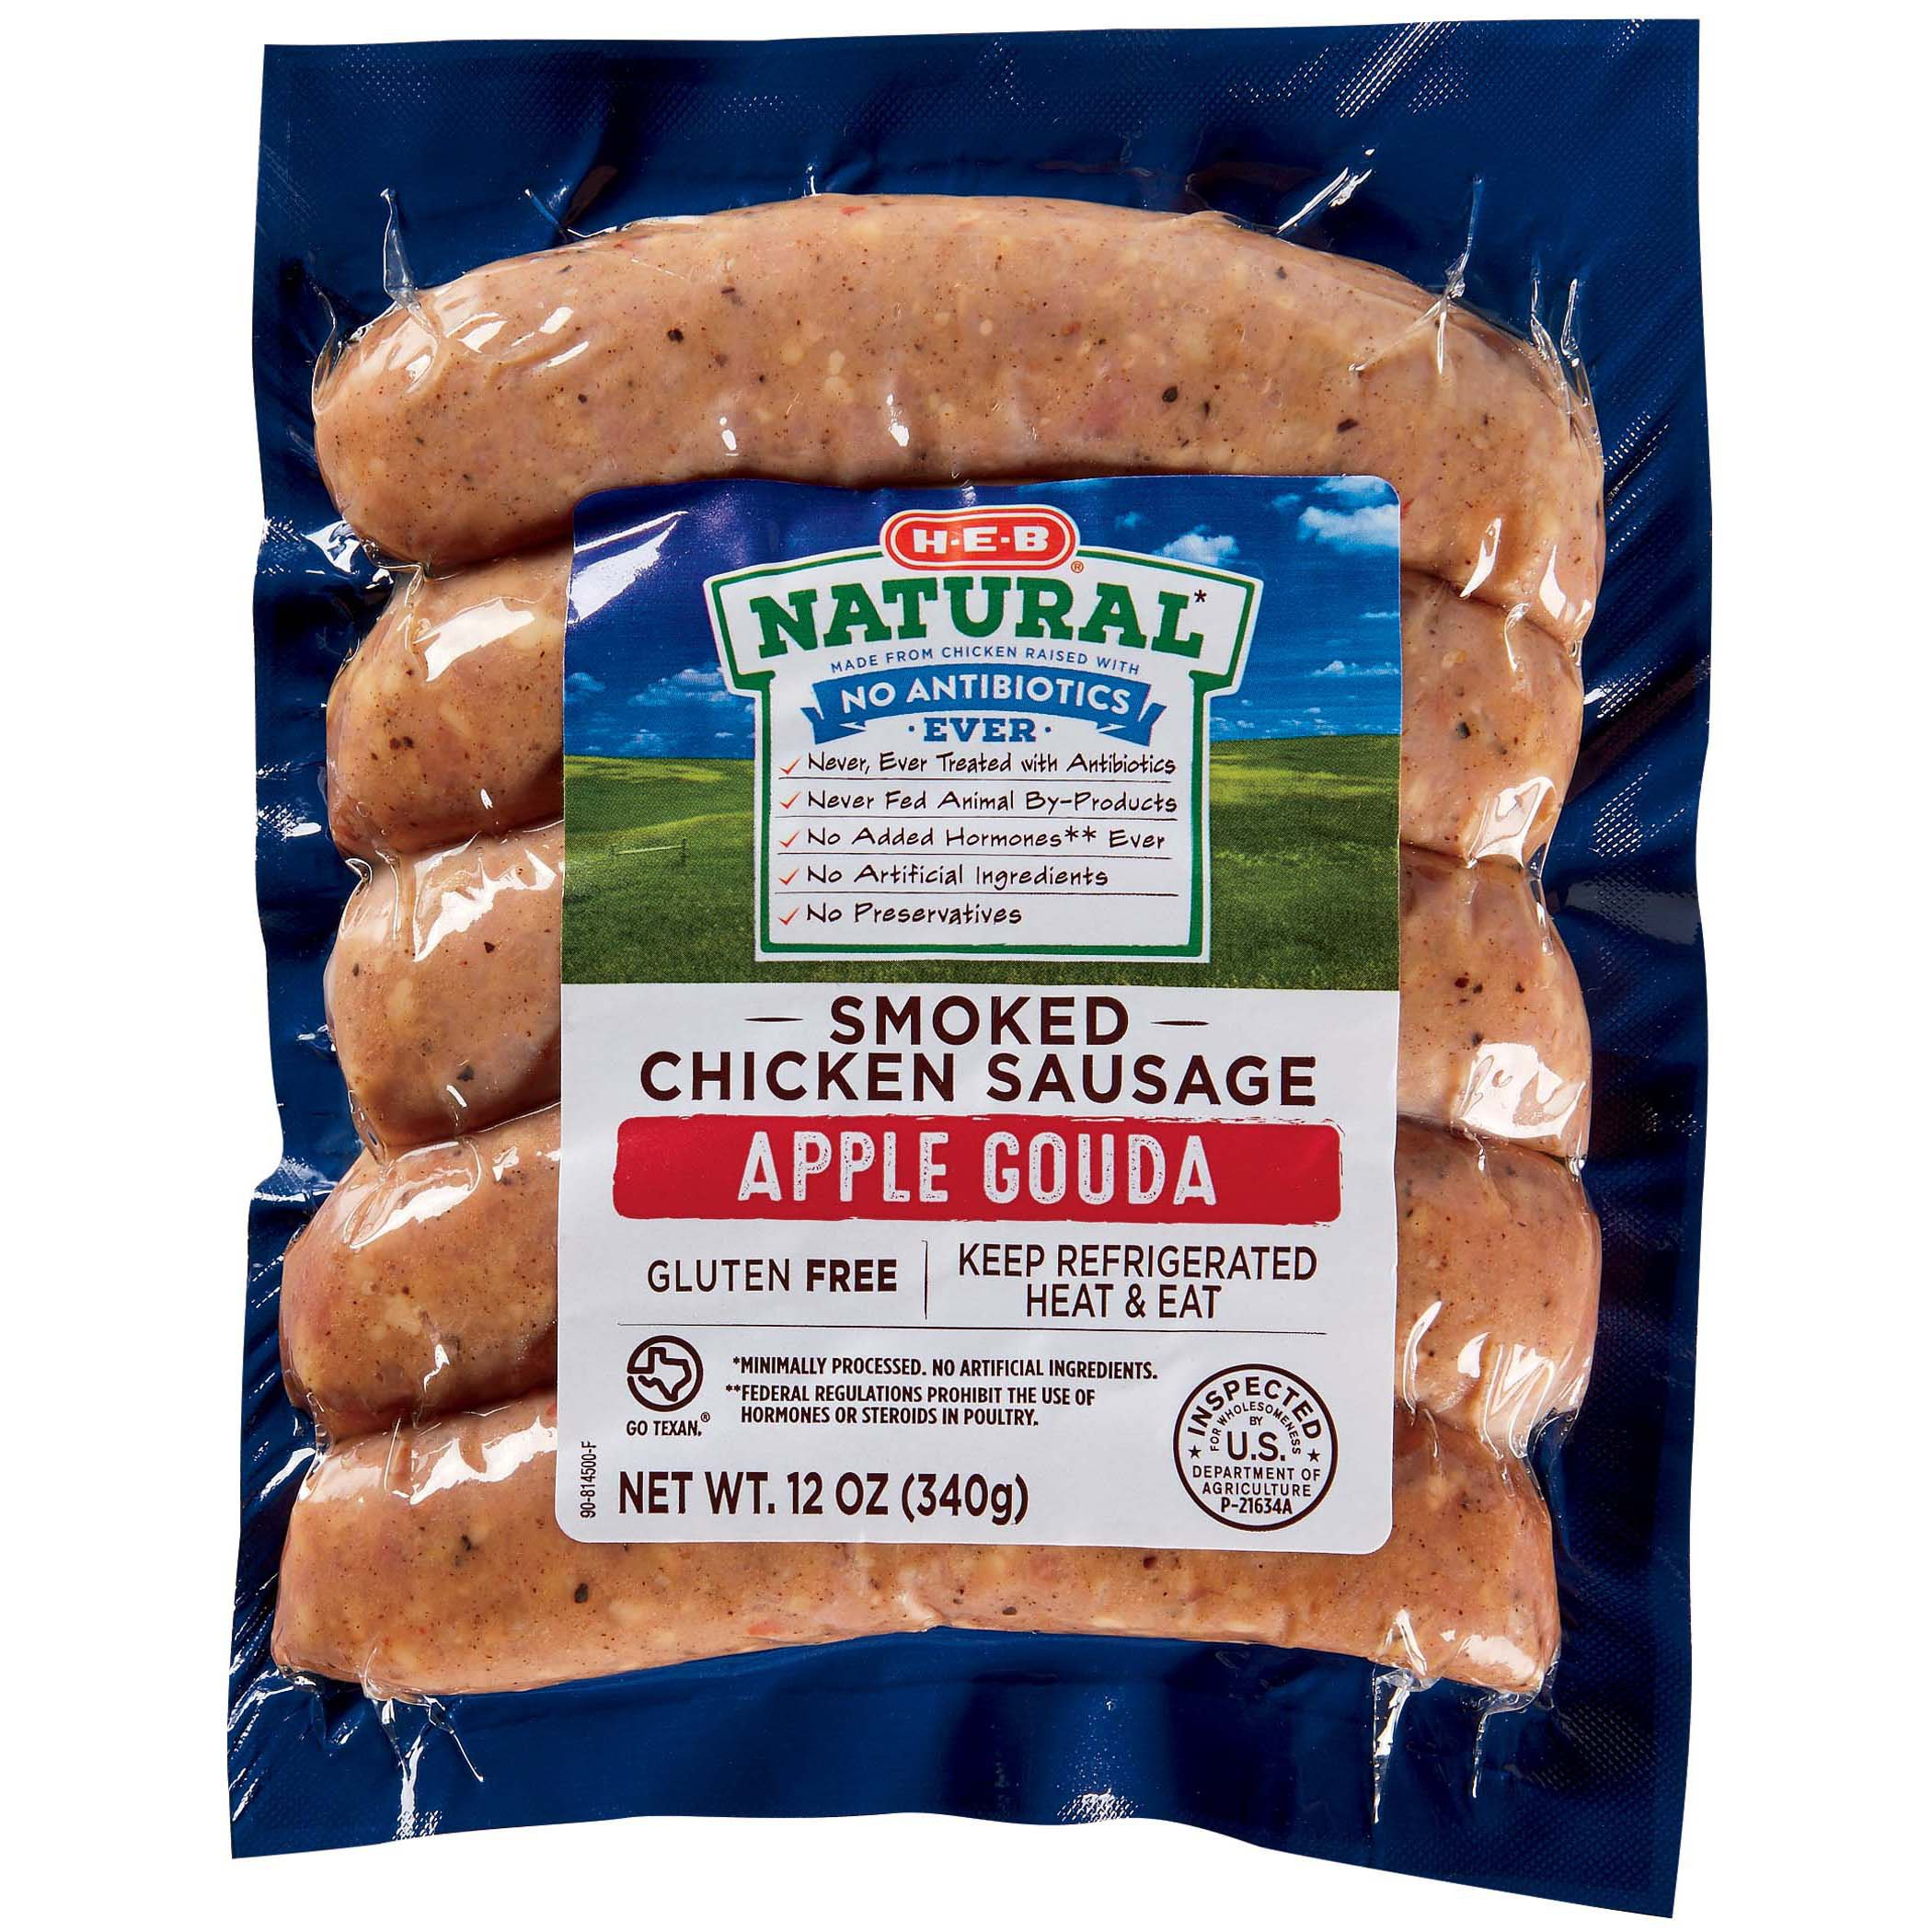 h e b chicken sausage with apple gouda